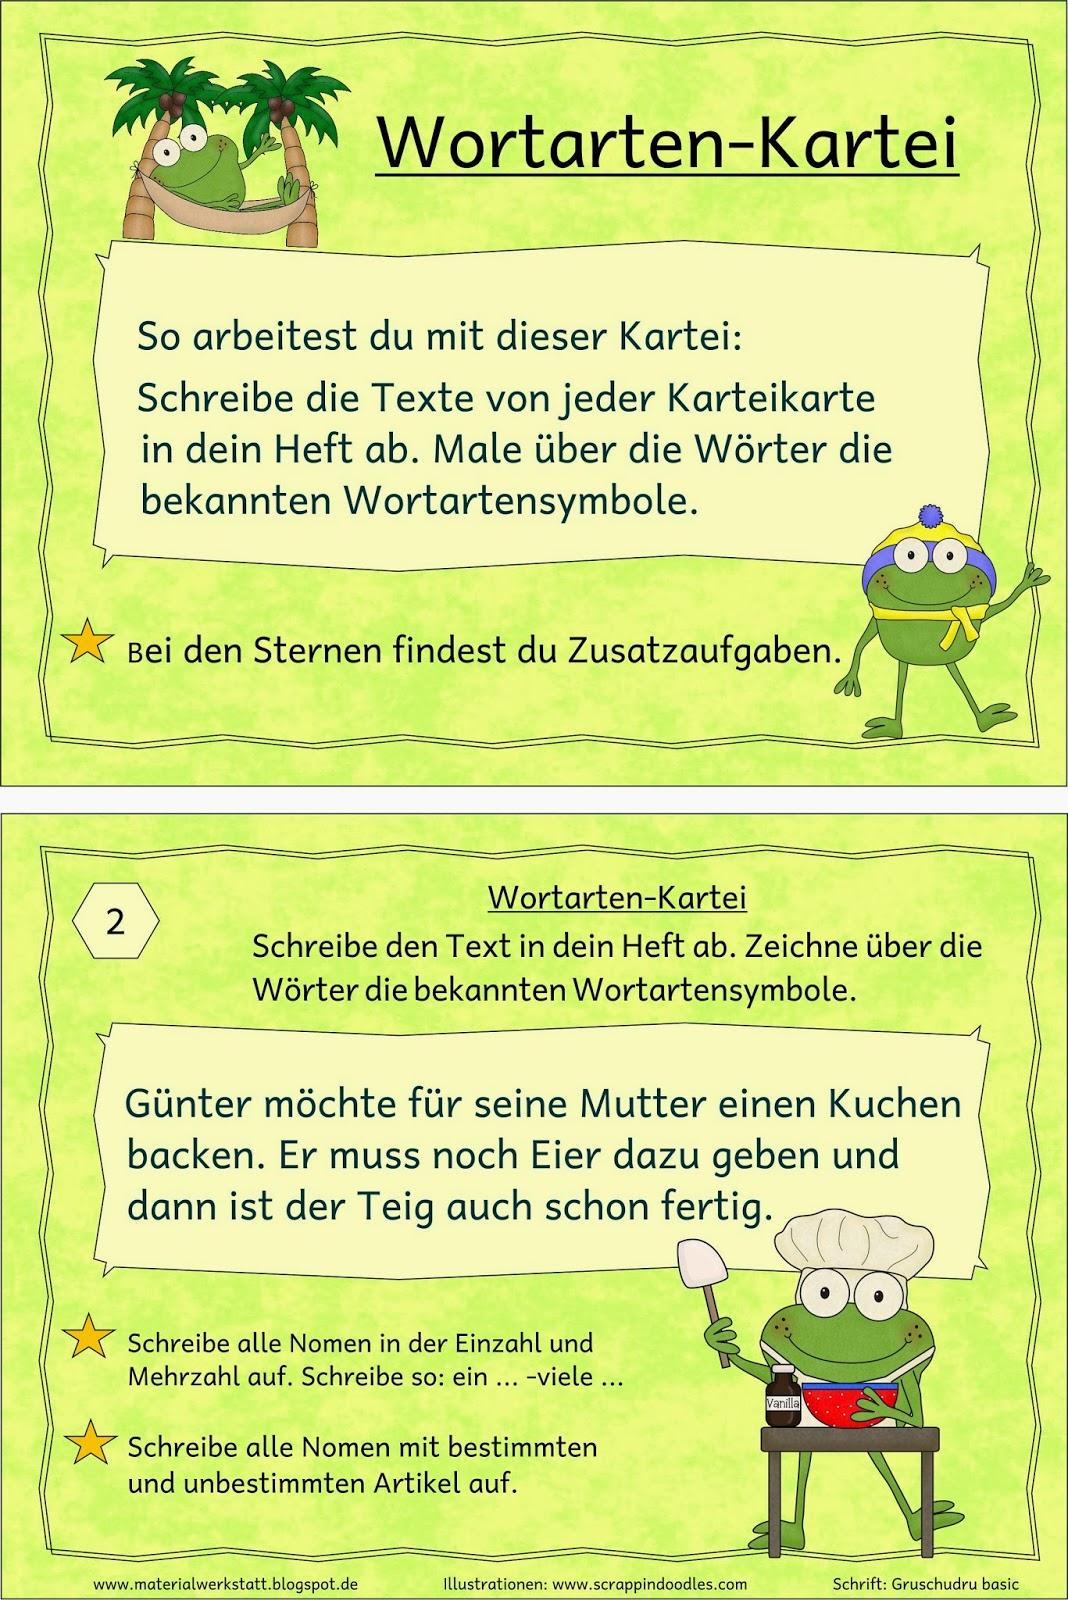 Materialwerkstatt wortarten kartei frosch - Frosch auf englisch ...